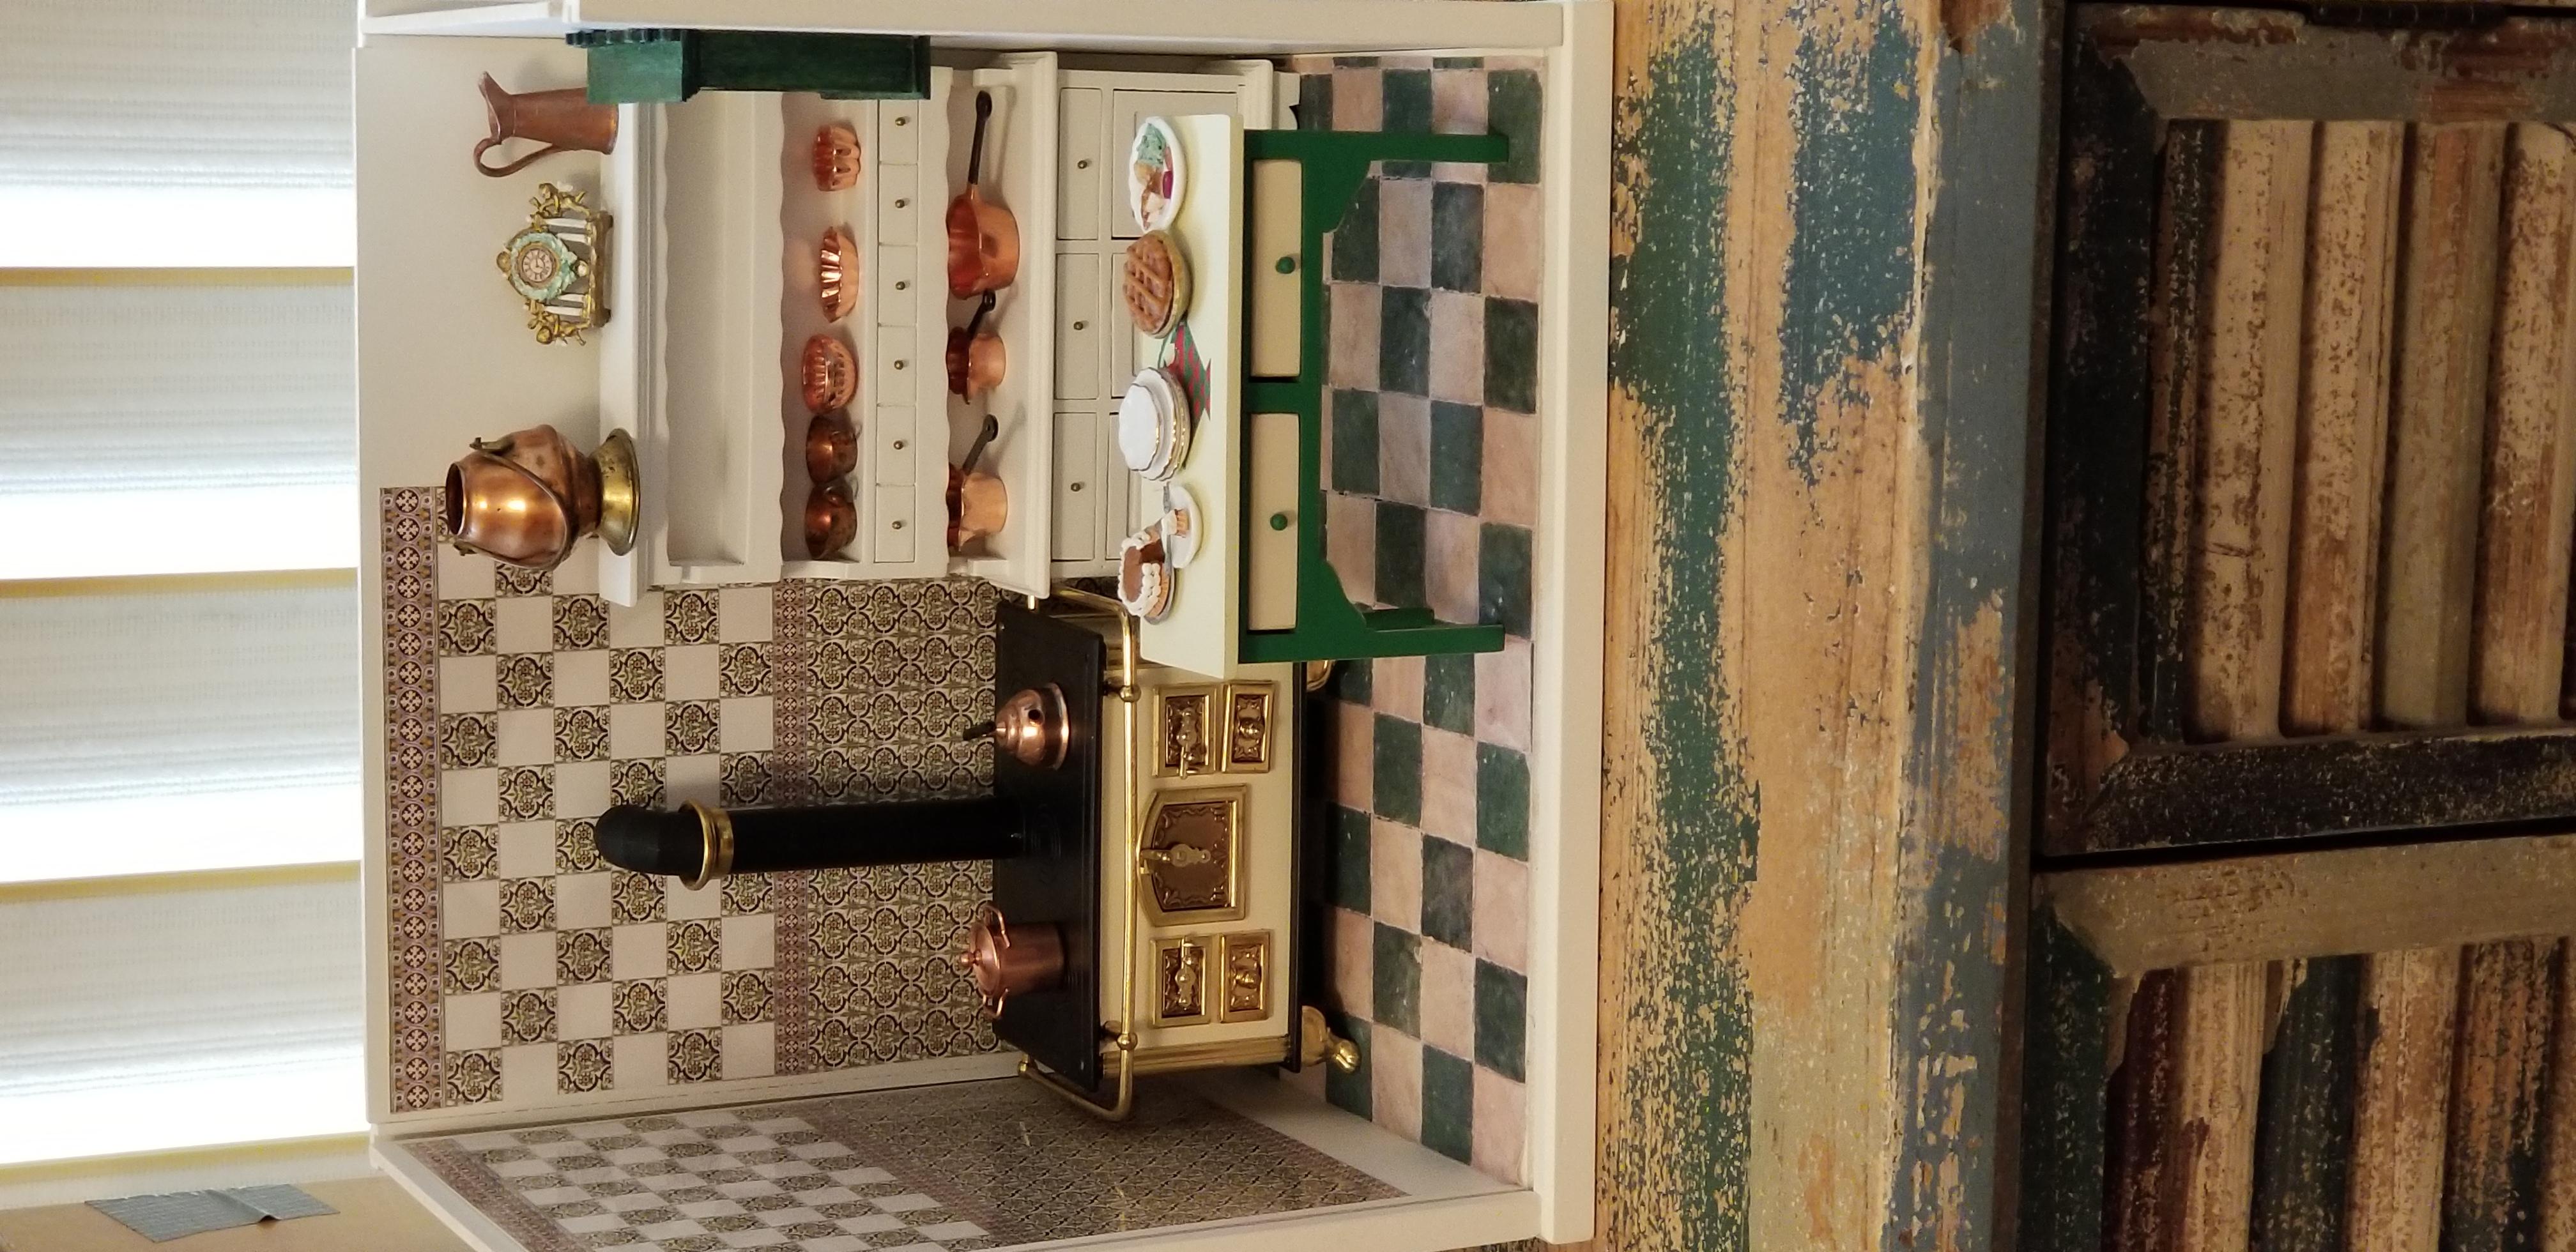 Monet's Kitchen